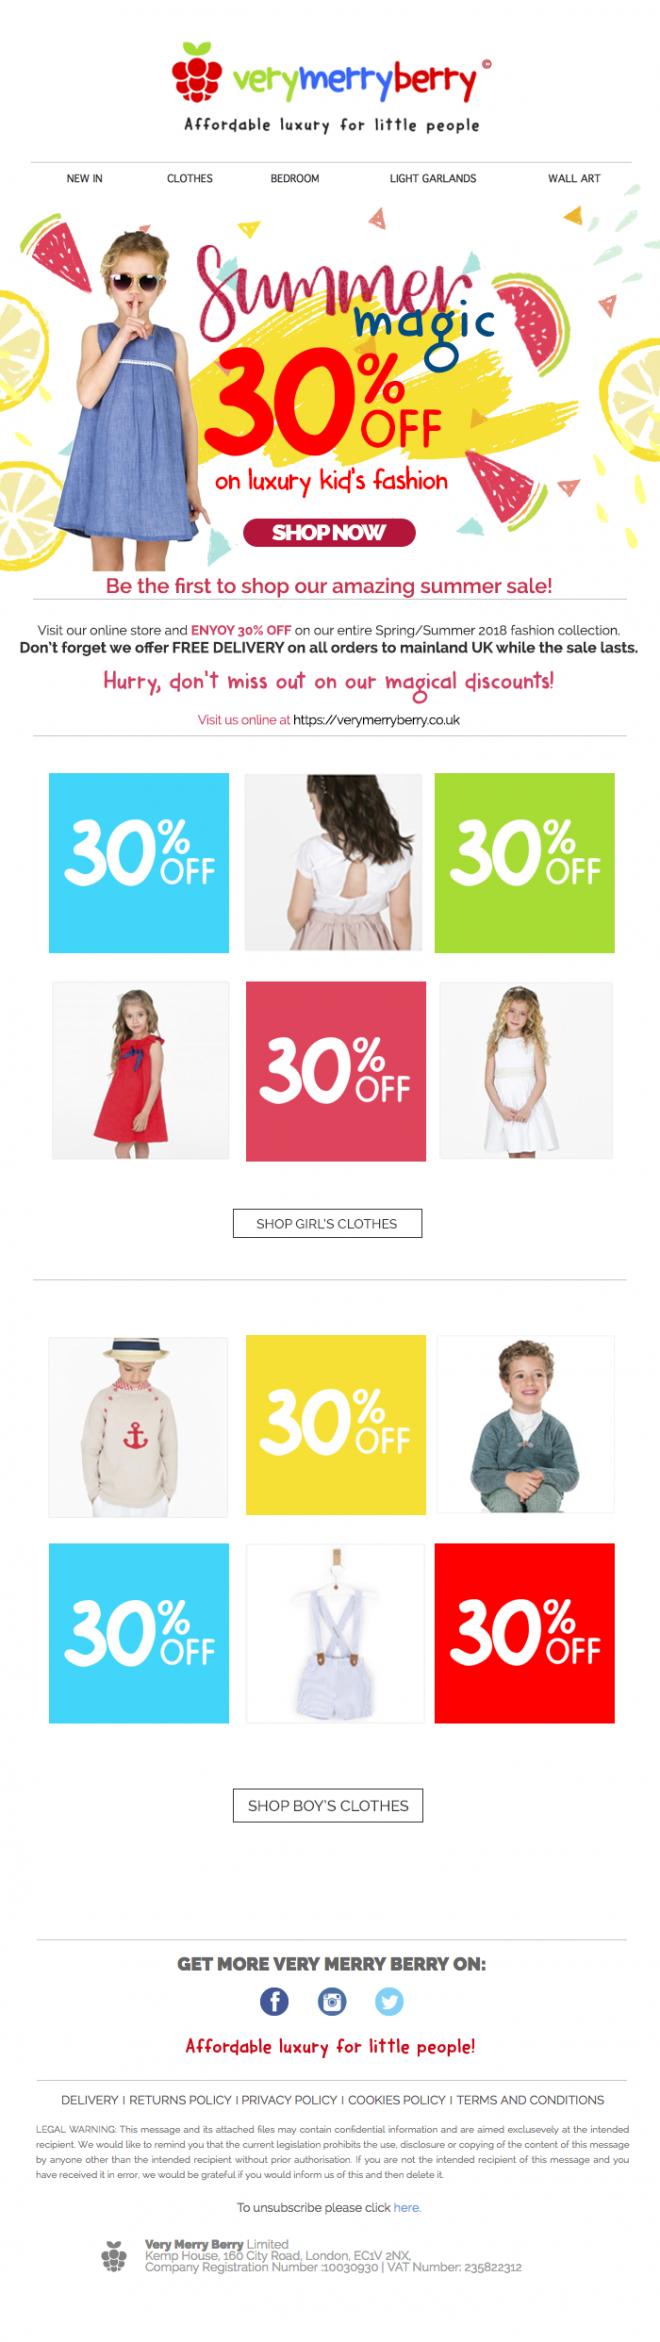 Newsletter email marketing campaign para tiendas online ecommerce